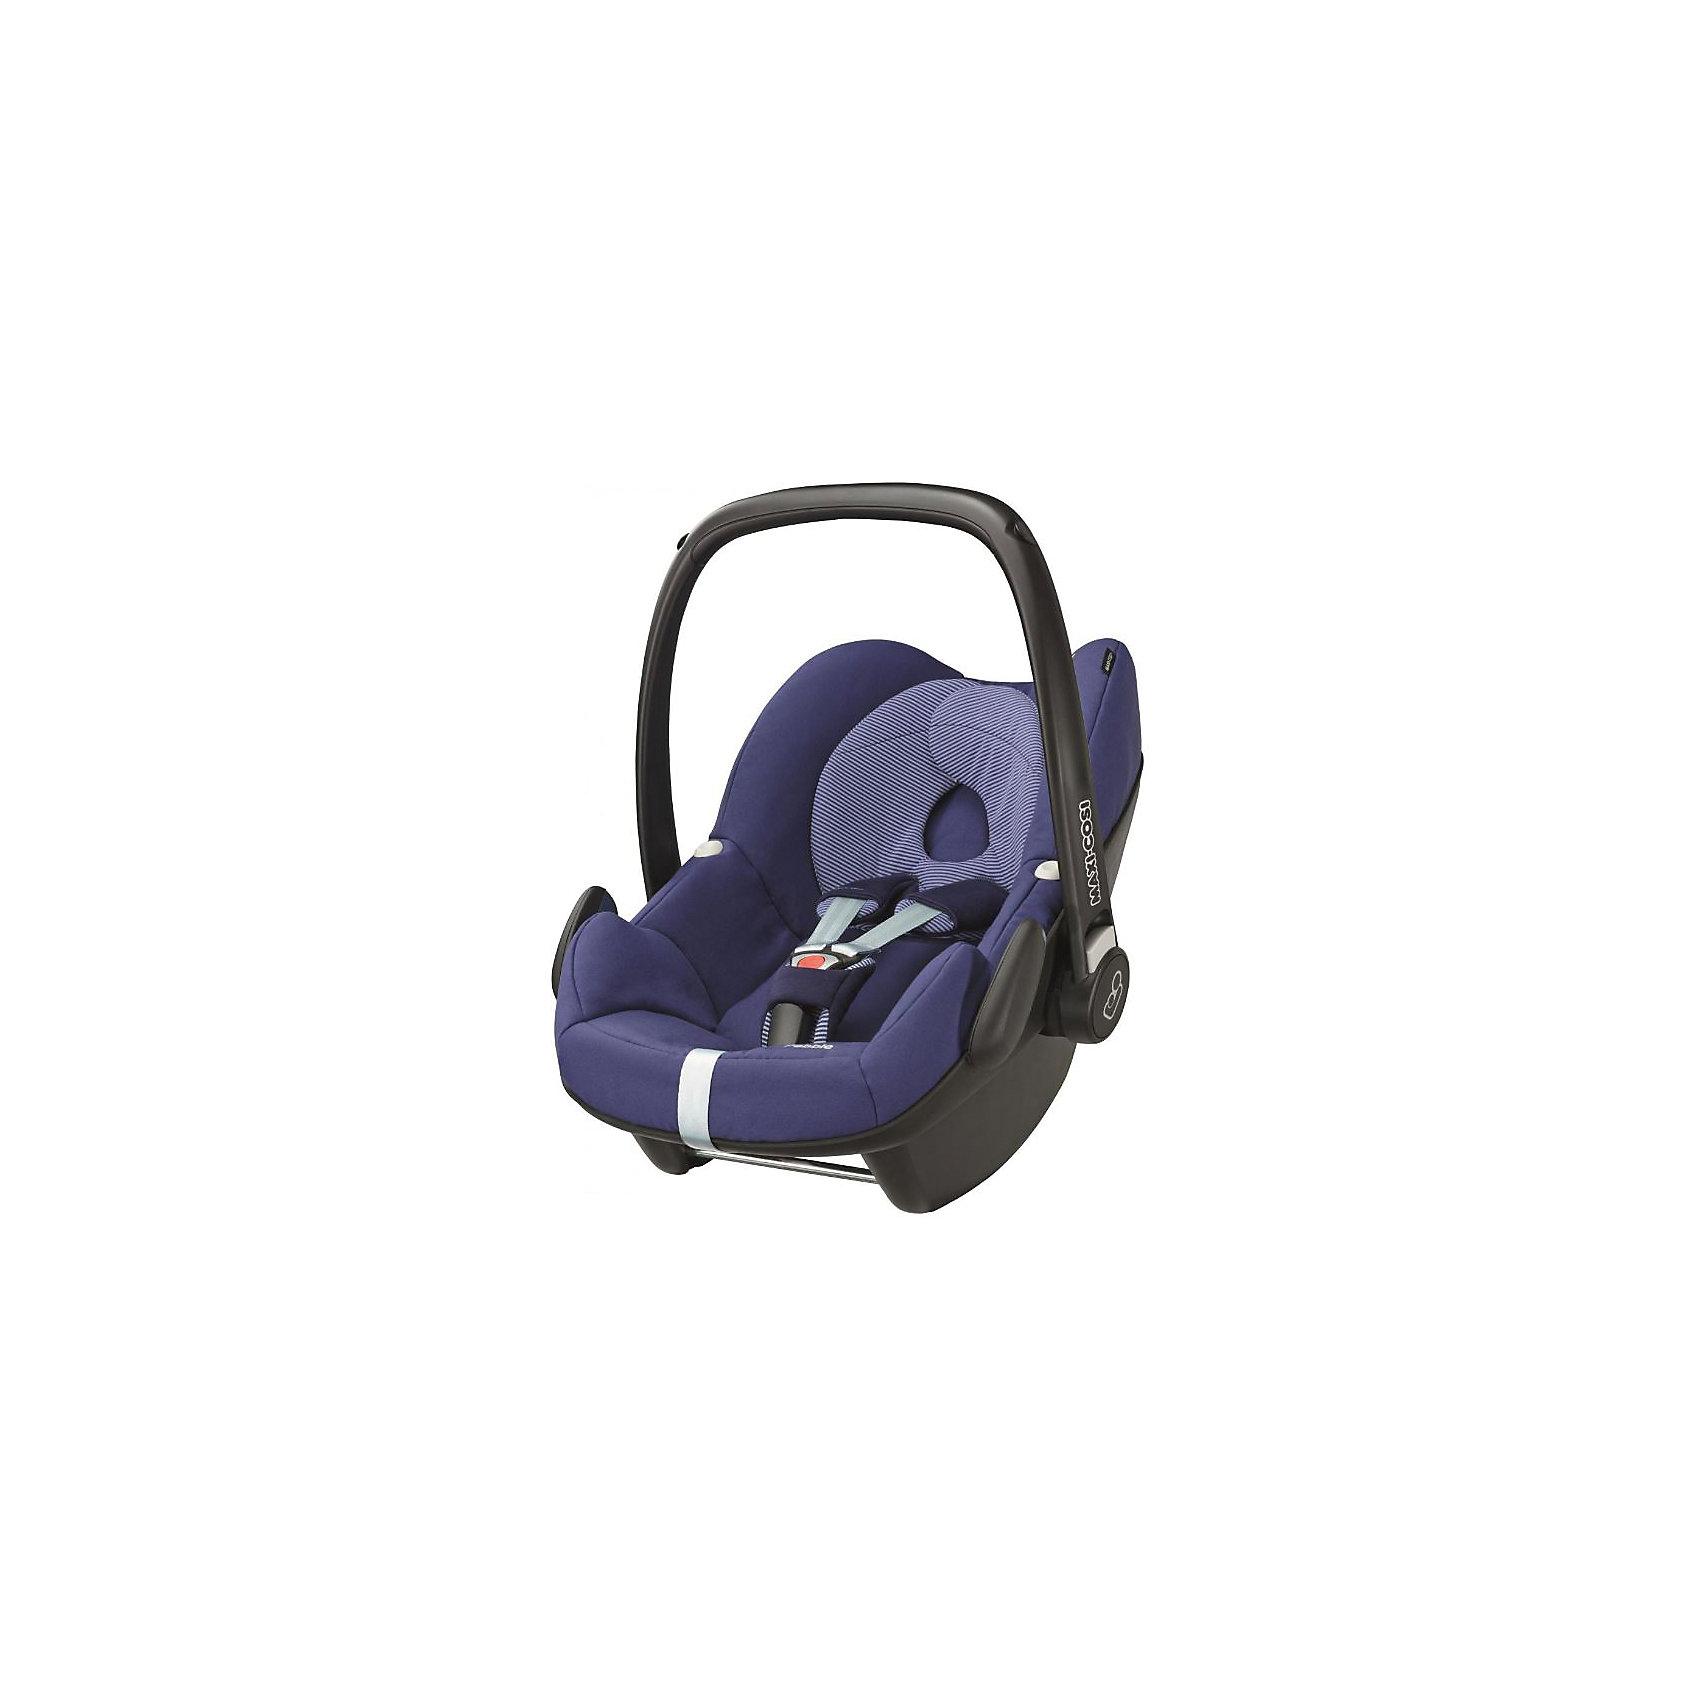 Maxi Cosi Автокресло Maxi-Cosi Pebble 0-13 кг, River Blue